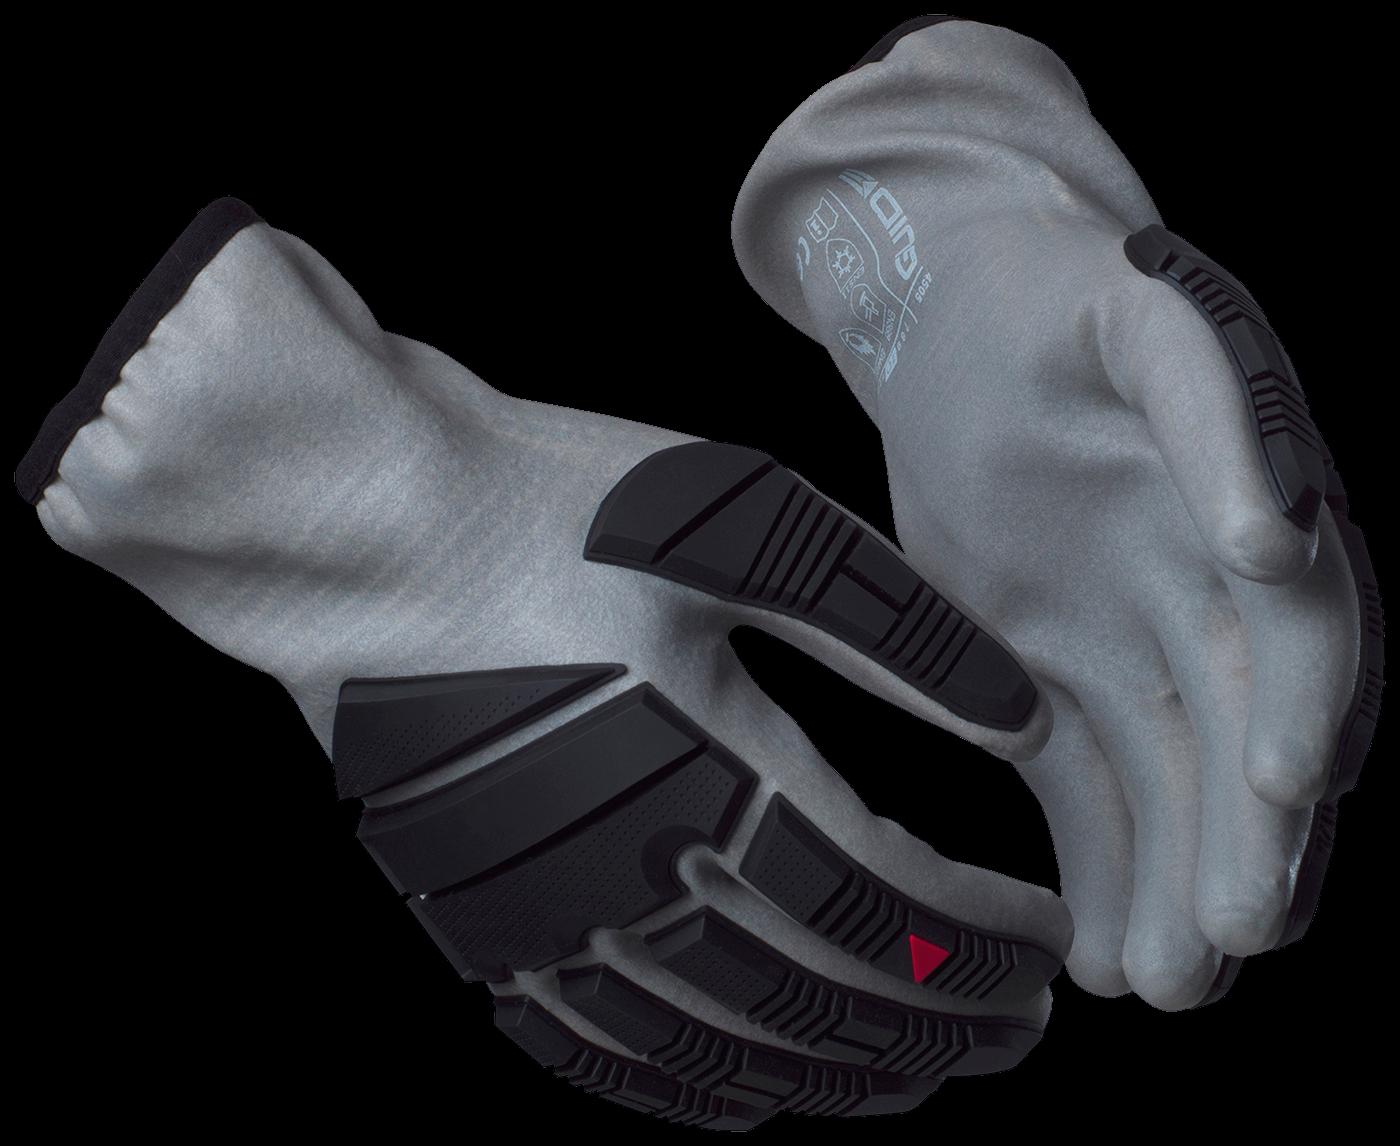 Work glove GUIDE 4505